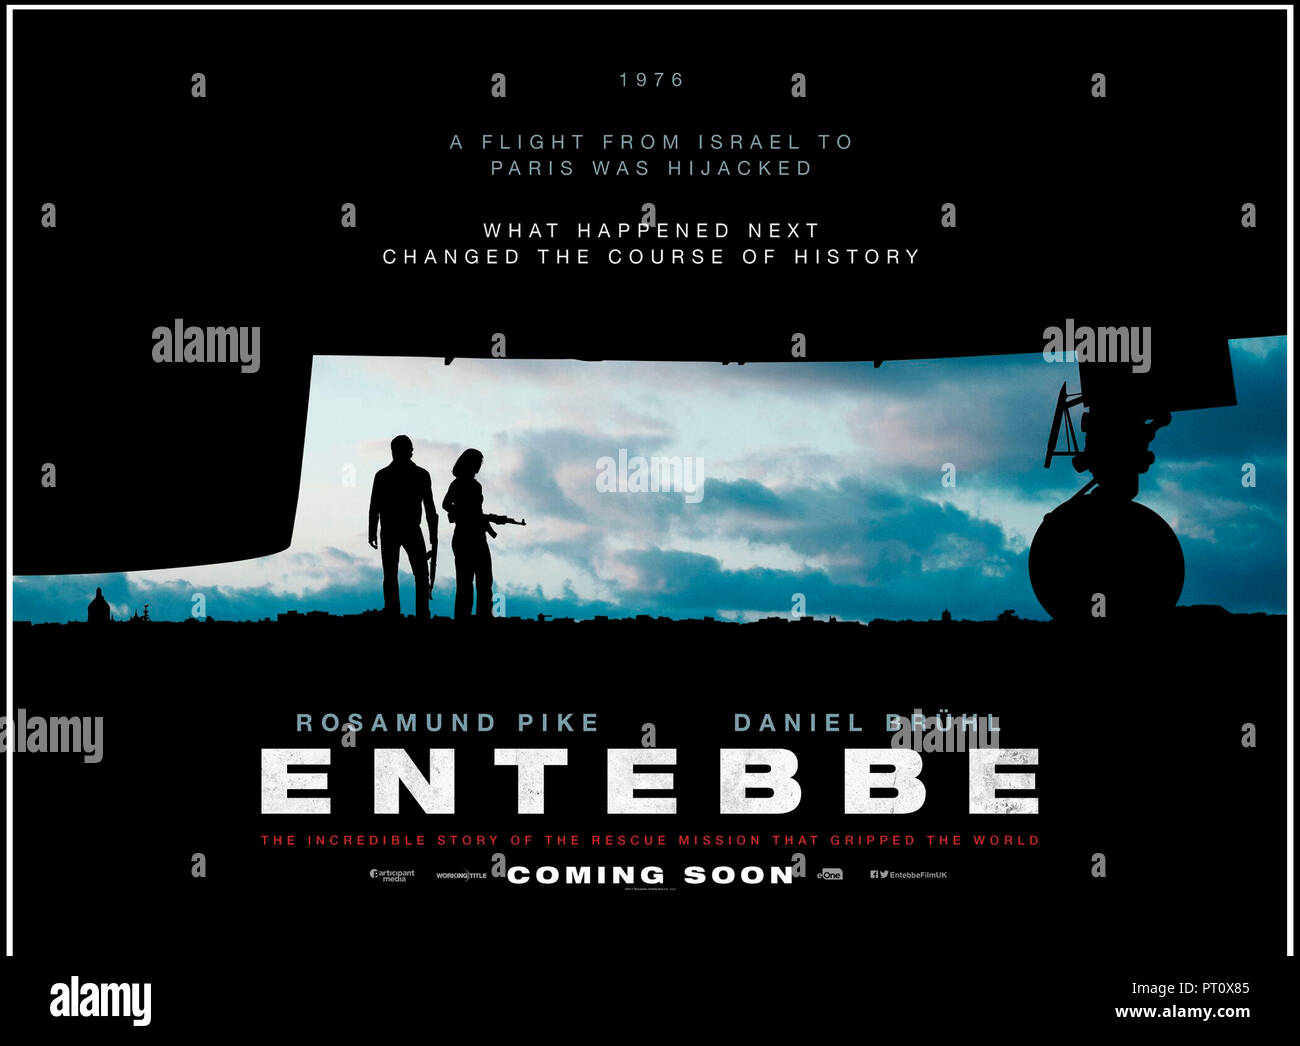 Prod DB © Participant Media - Pellikola - Working Title Films / DR OTAGES A ENTEBBE (ENTEBBE) de Jose Padilha 2018 GB/USA teaser anglais avec Rosamund - Stock Image